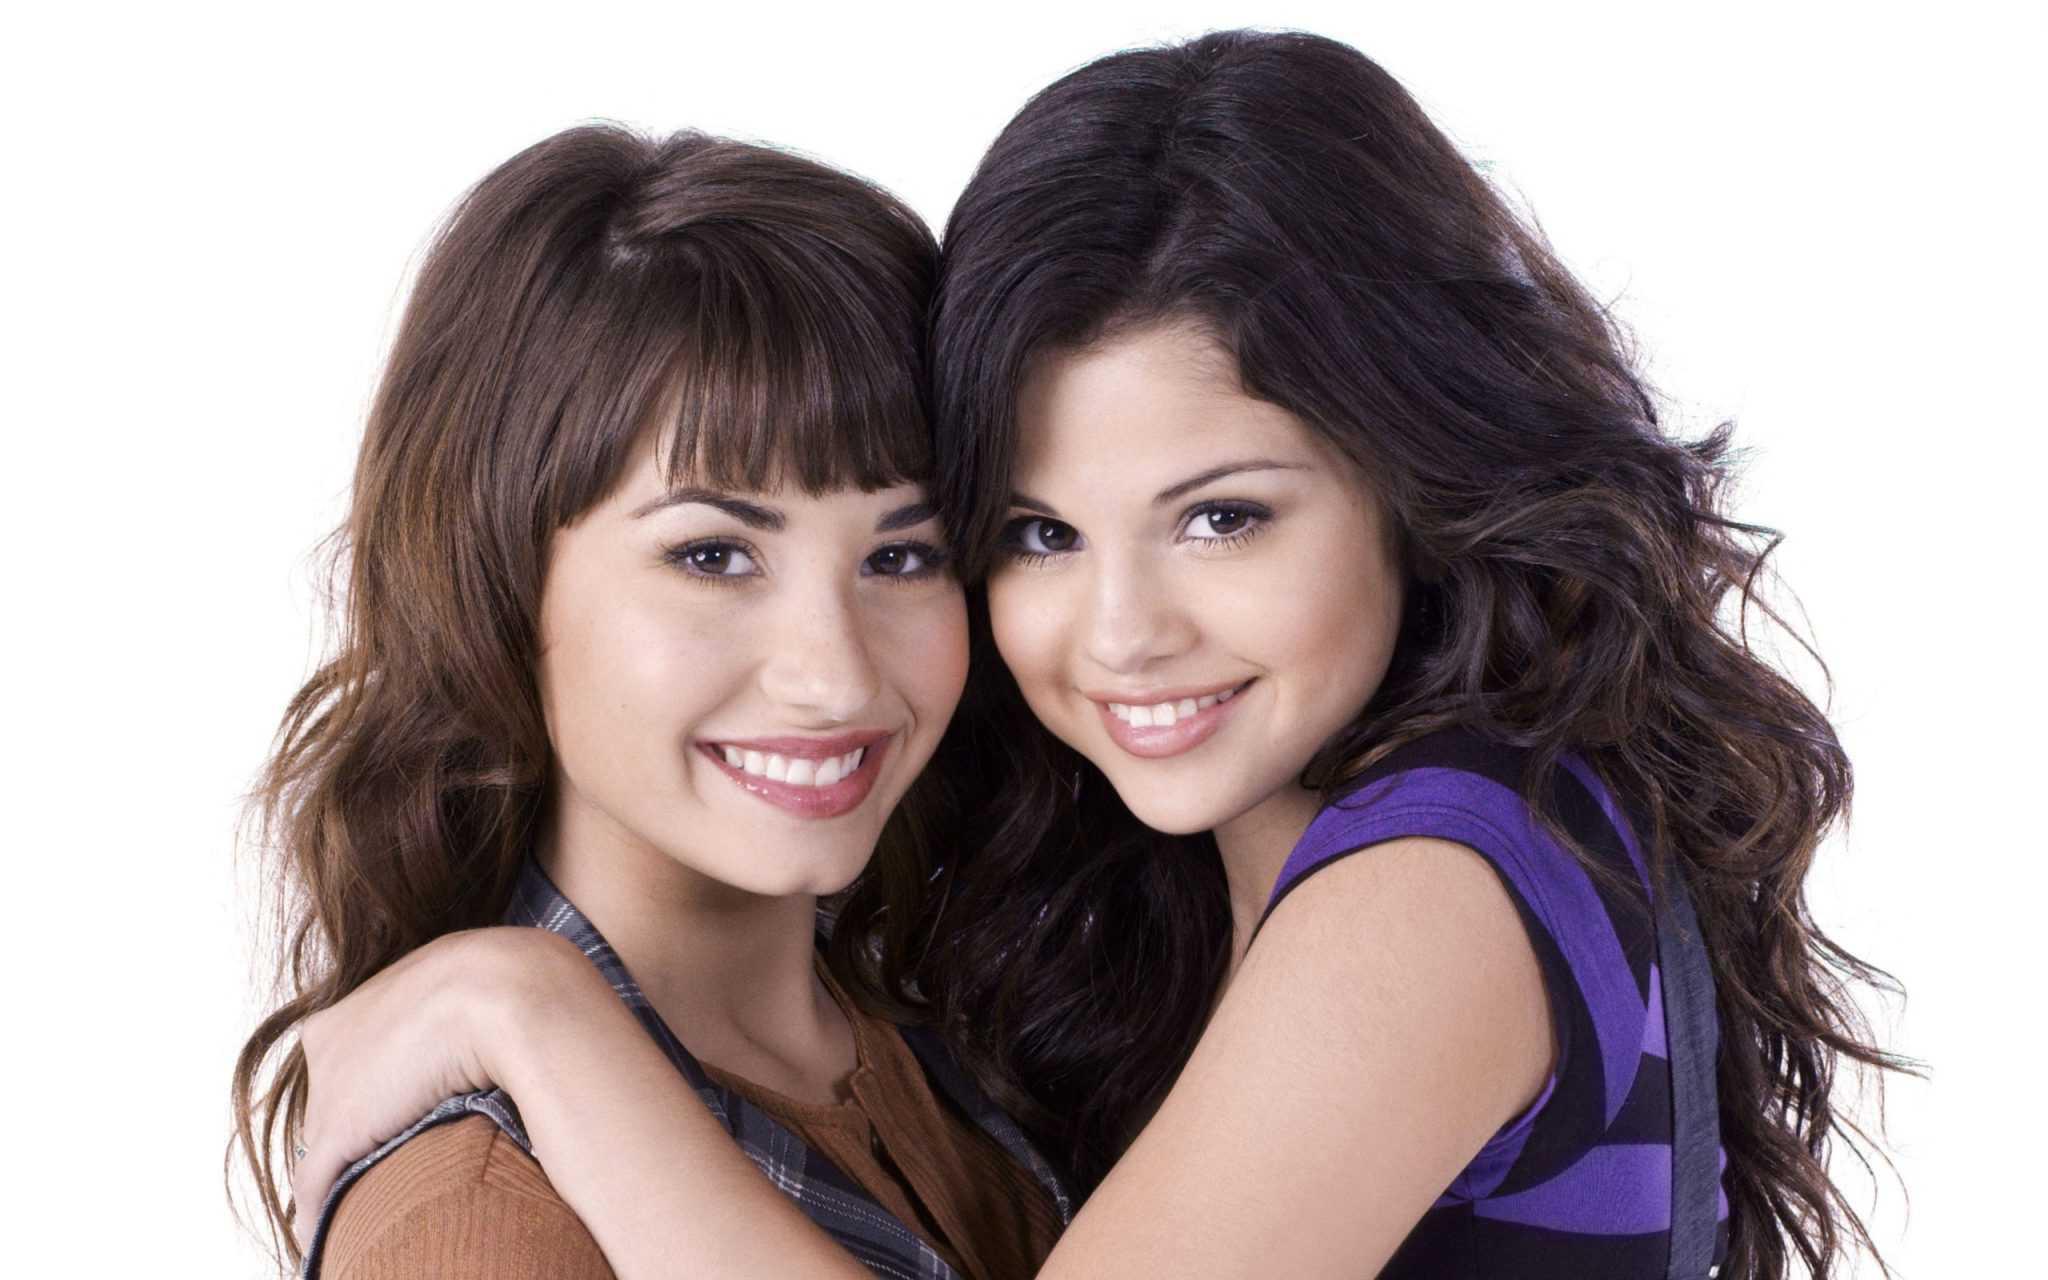 Selena Gomez's Birthday Wishes for Ex-Bff Demi Lovato Wins Fans' Hearts